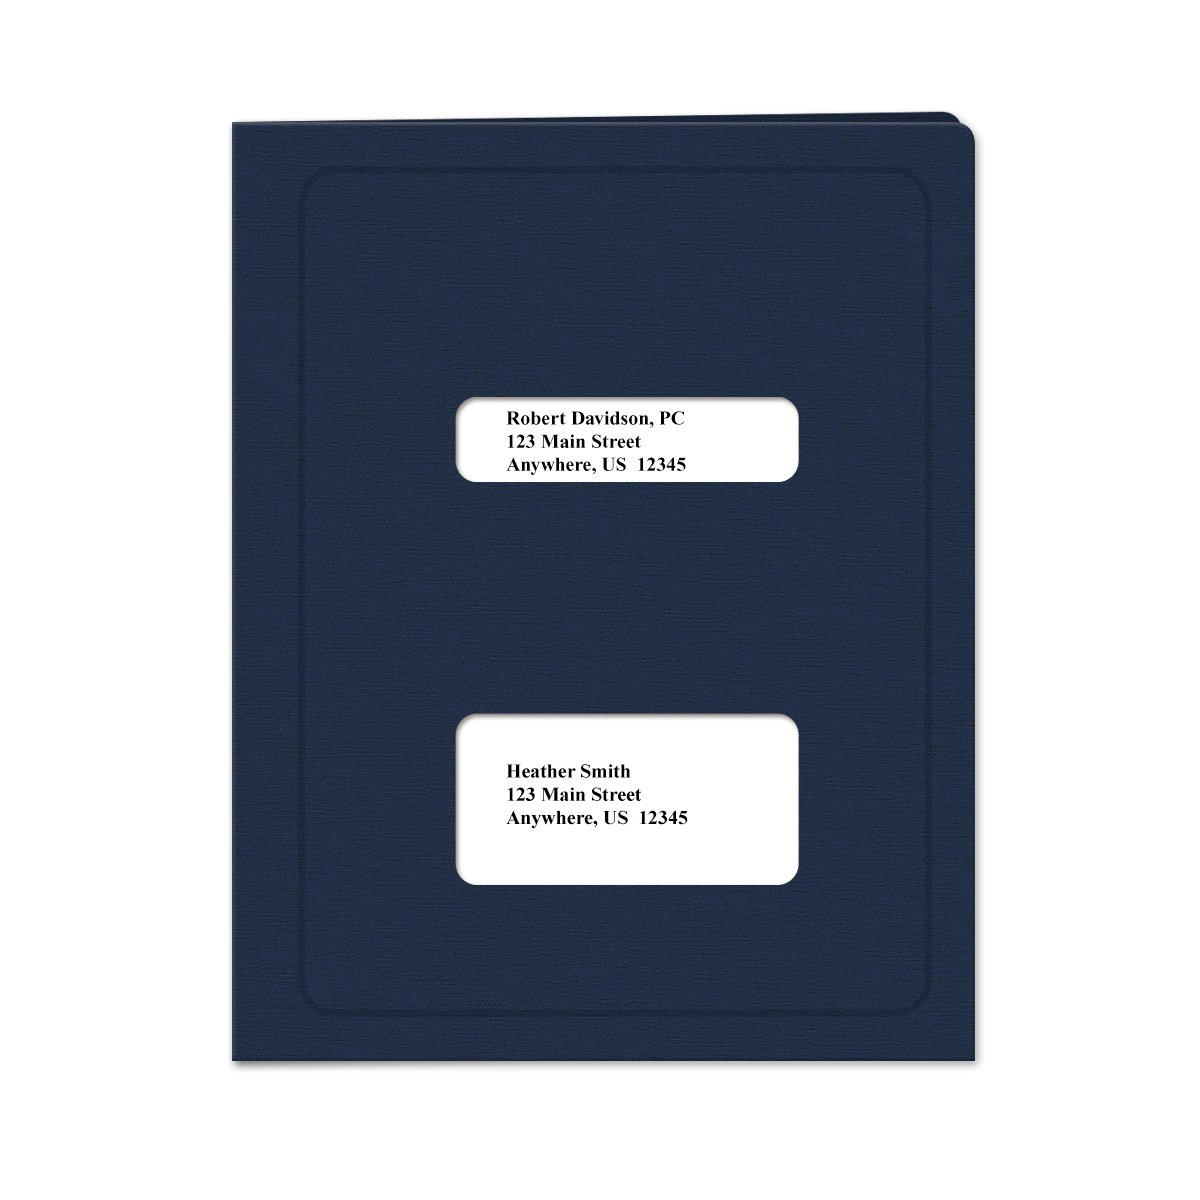 Double Window Tax Return Software Pocket Folder - 50 Pack